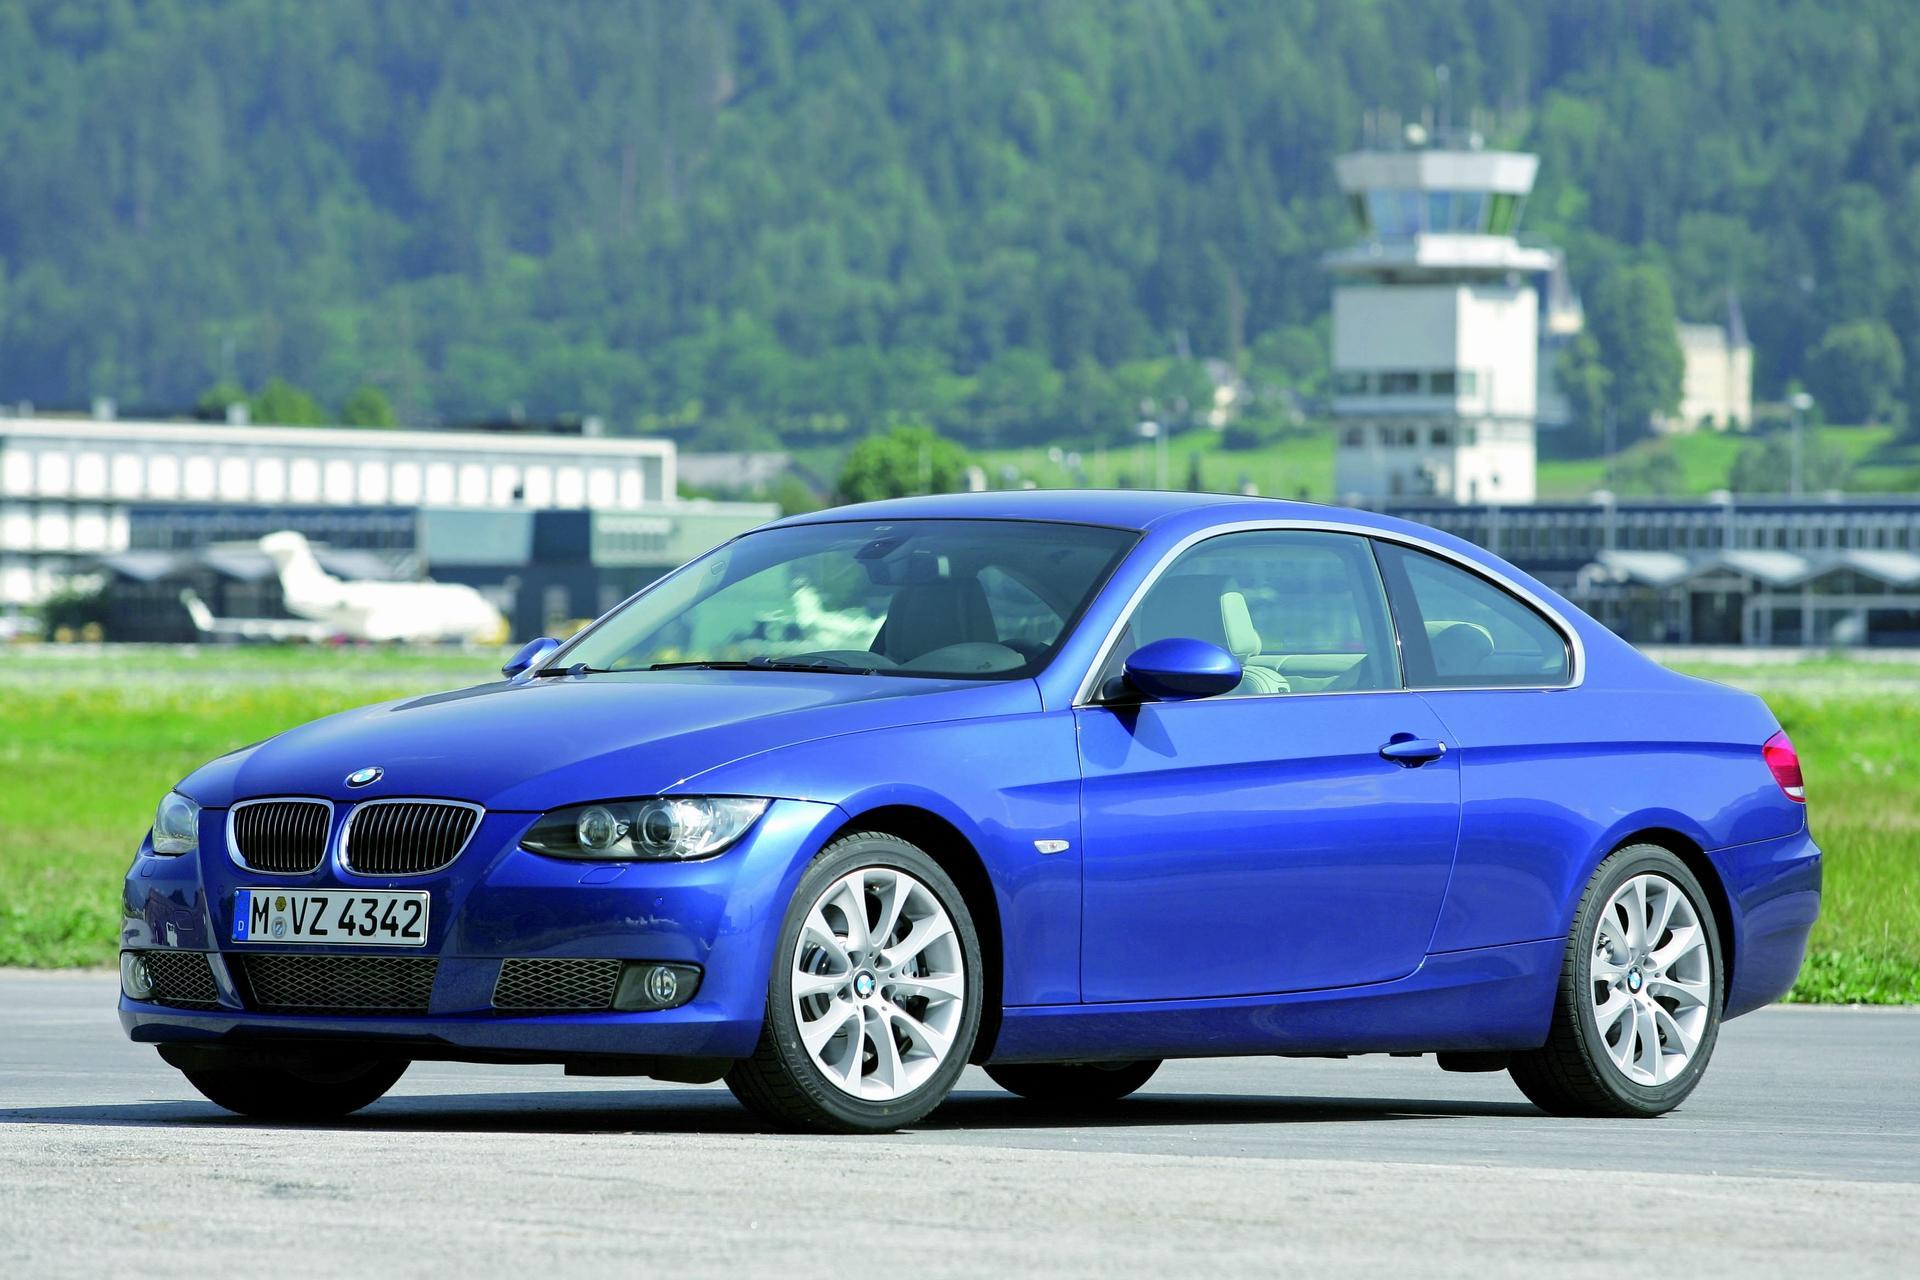 BMW 335i Coupe Blue Wallpaper Desktop Backgrounds